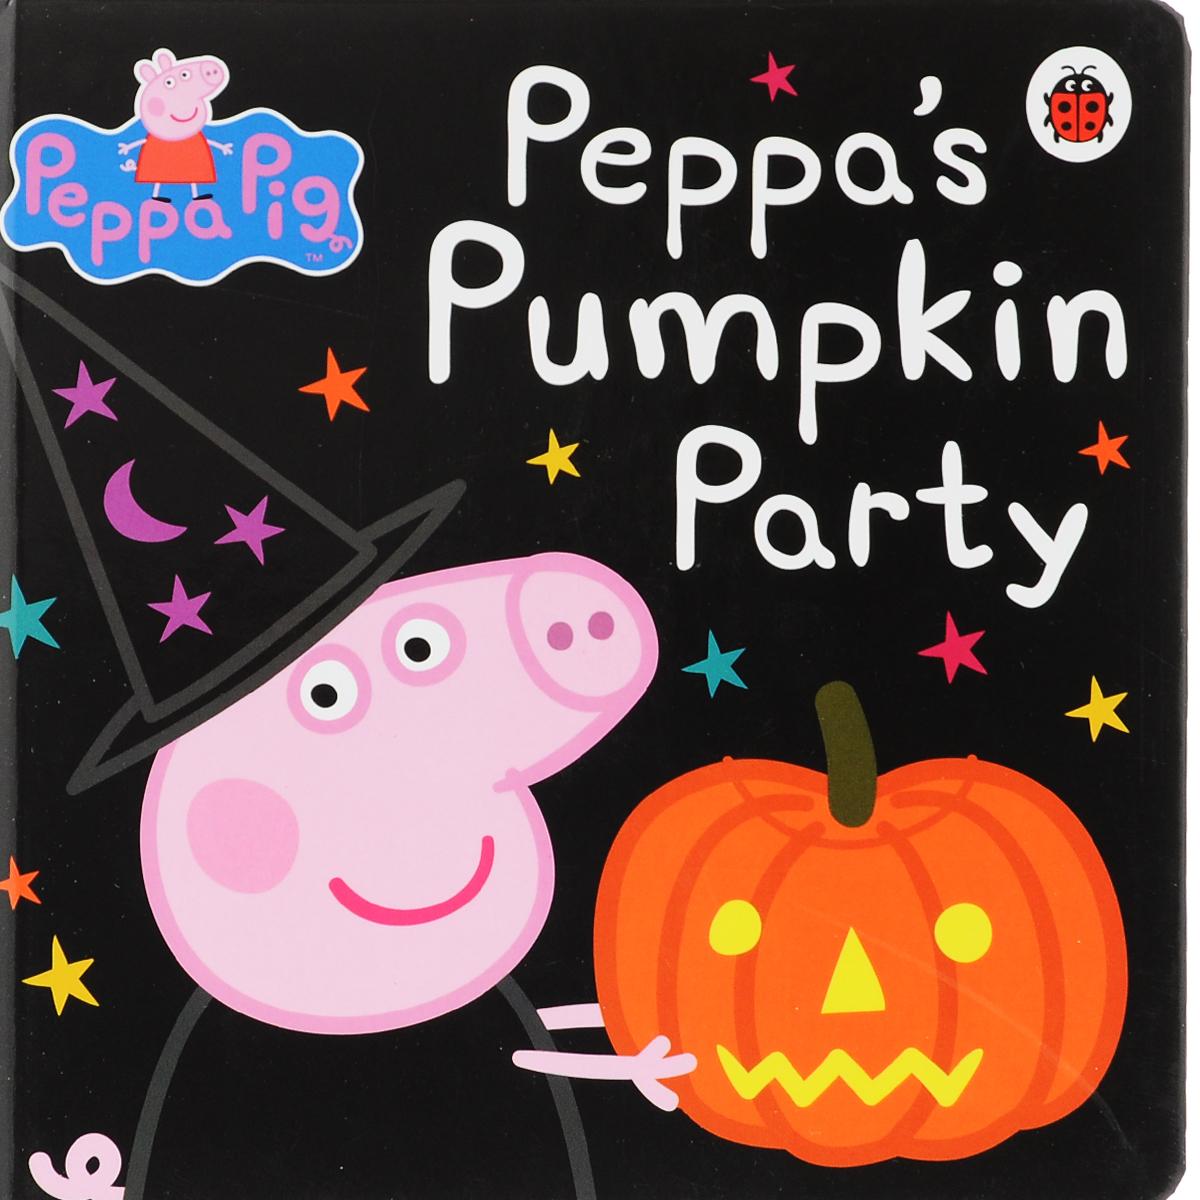 Купить Peppa Pig: Peppa's Pumpkin Party,